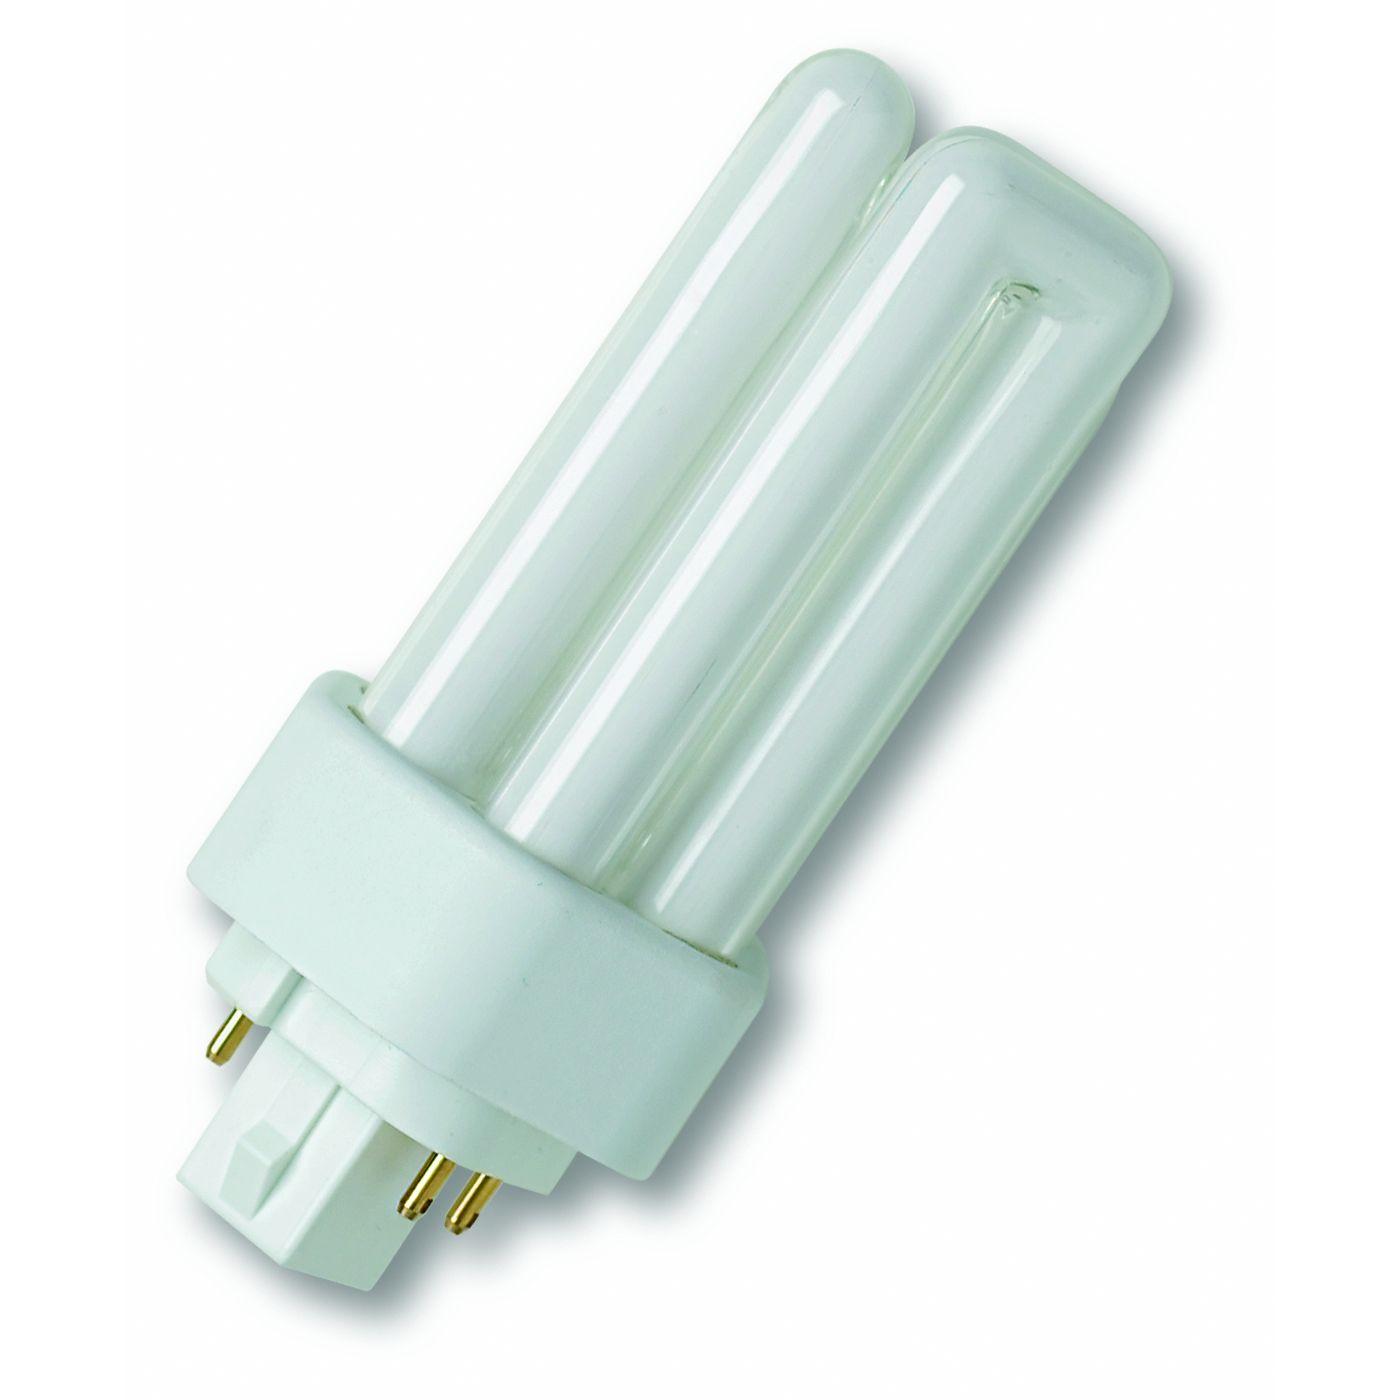 Osram Kompaktleuchtstofflampe Dreifach-Doppelrohr TC-TEL 42W/840 GX24q-4 kaltweiß